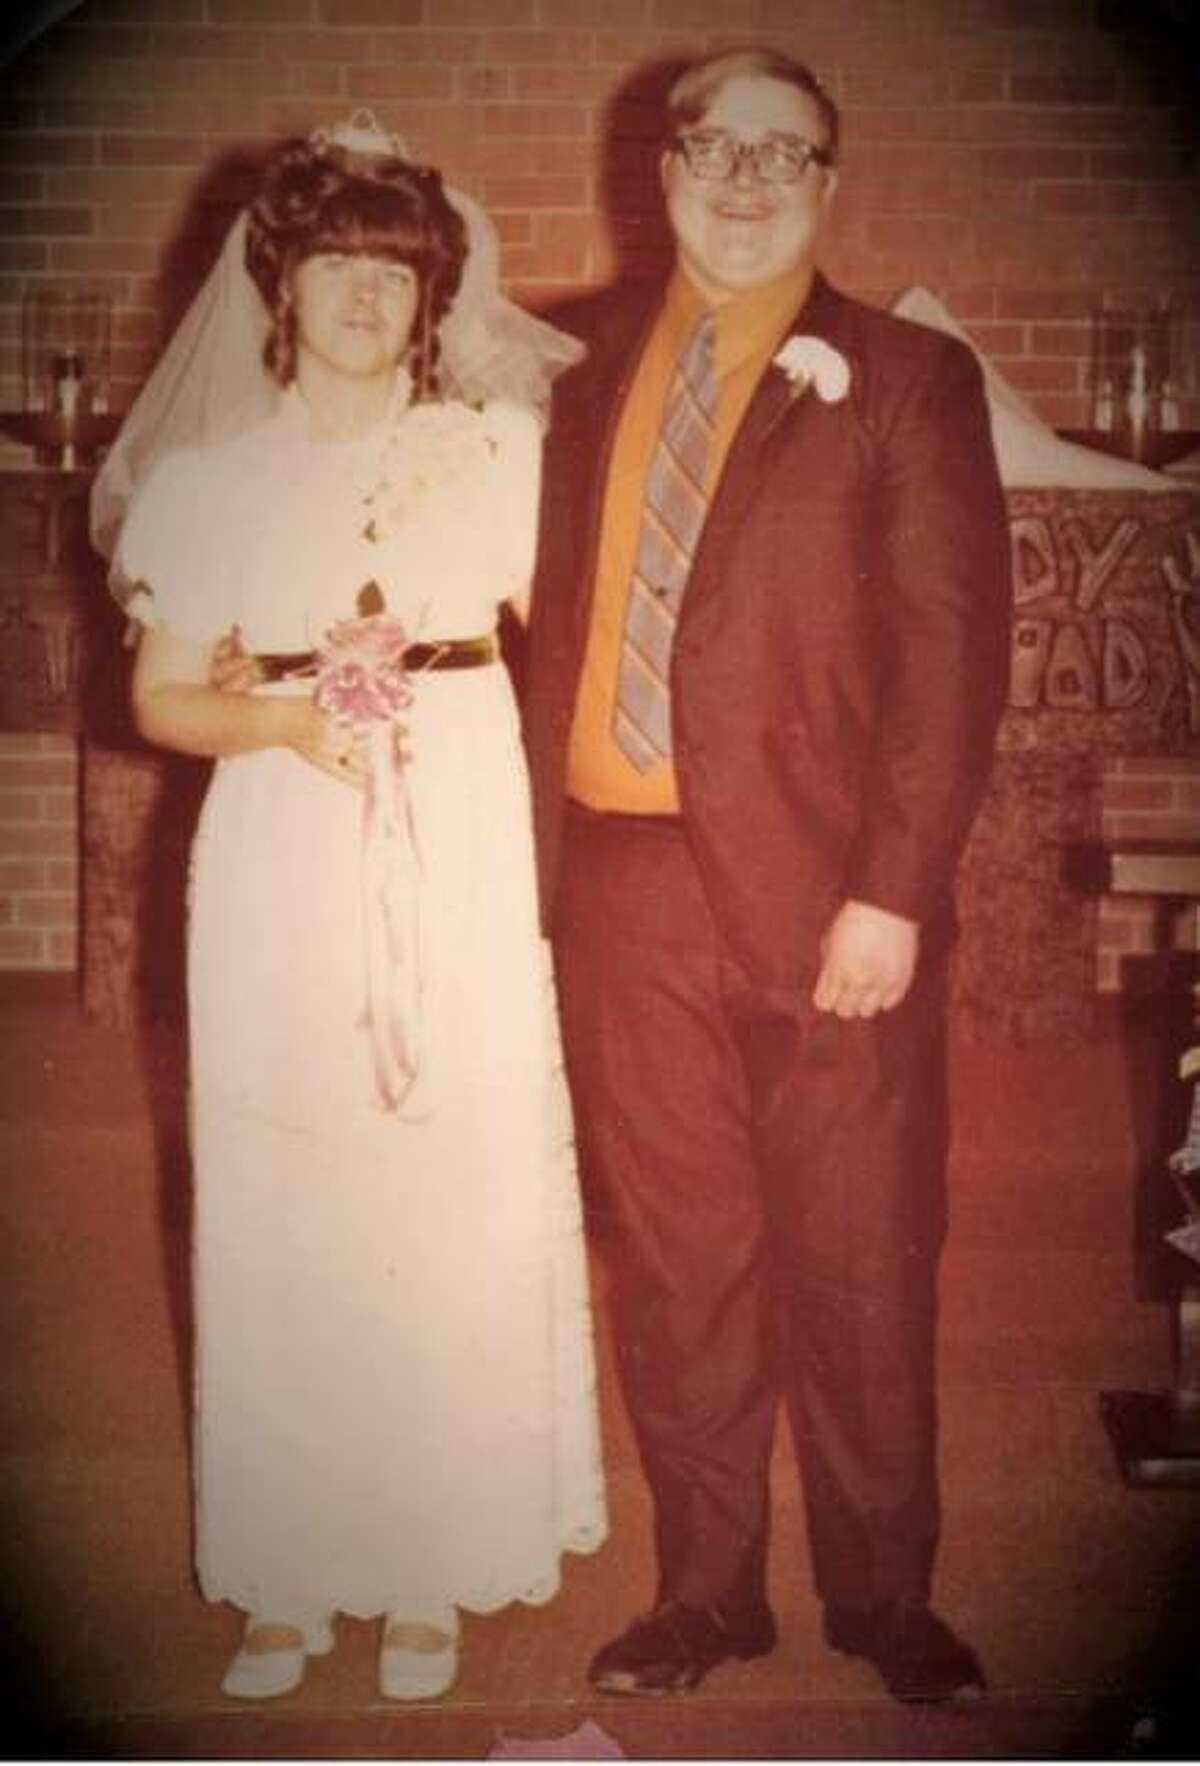 Richard and Sharon Chambers at their wedding